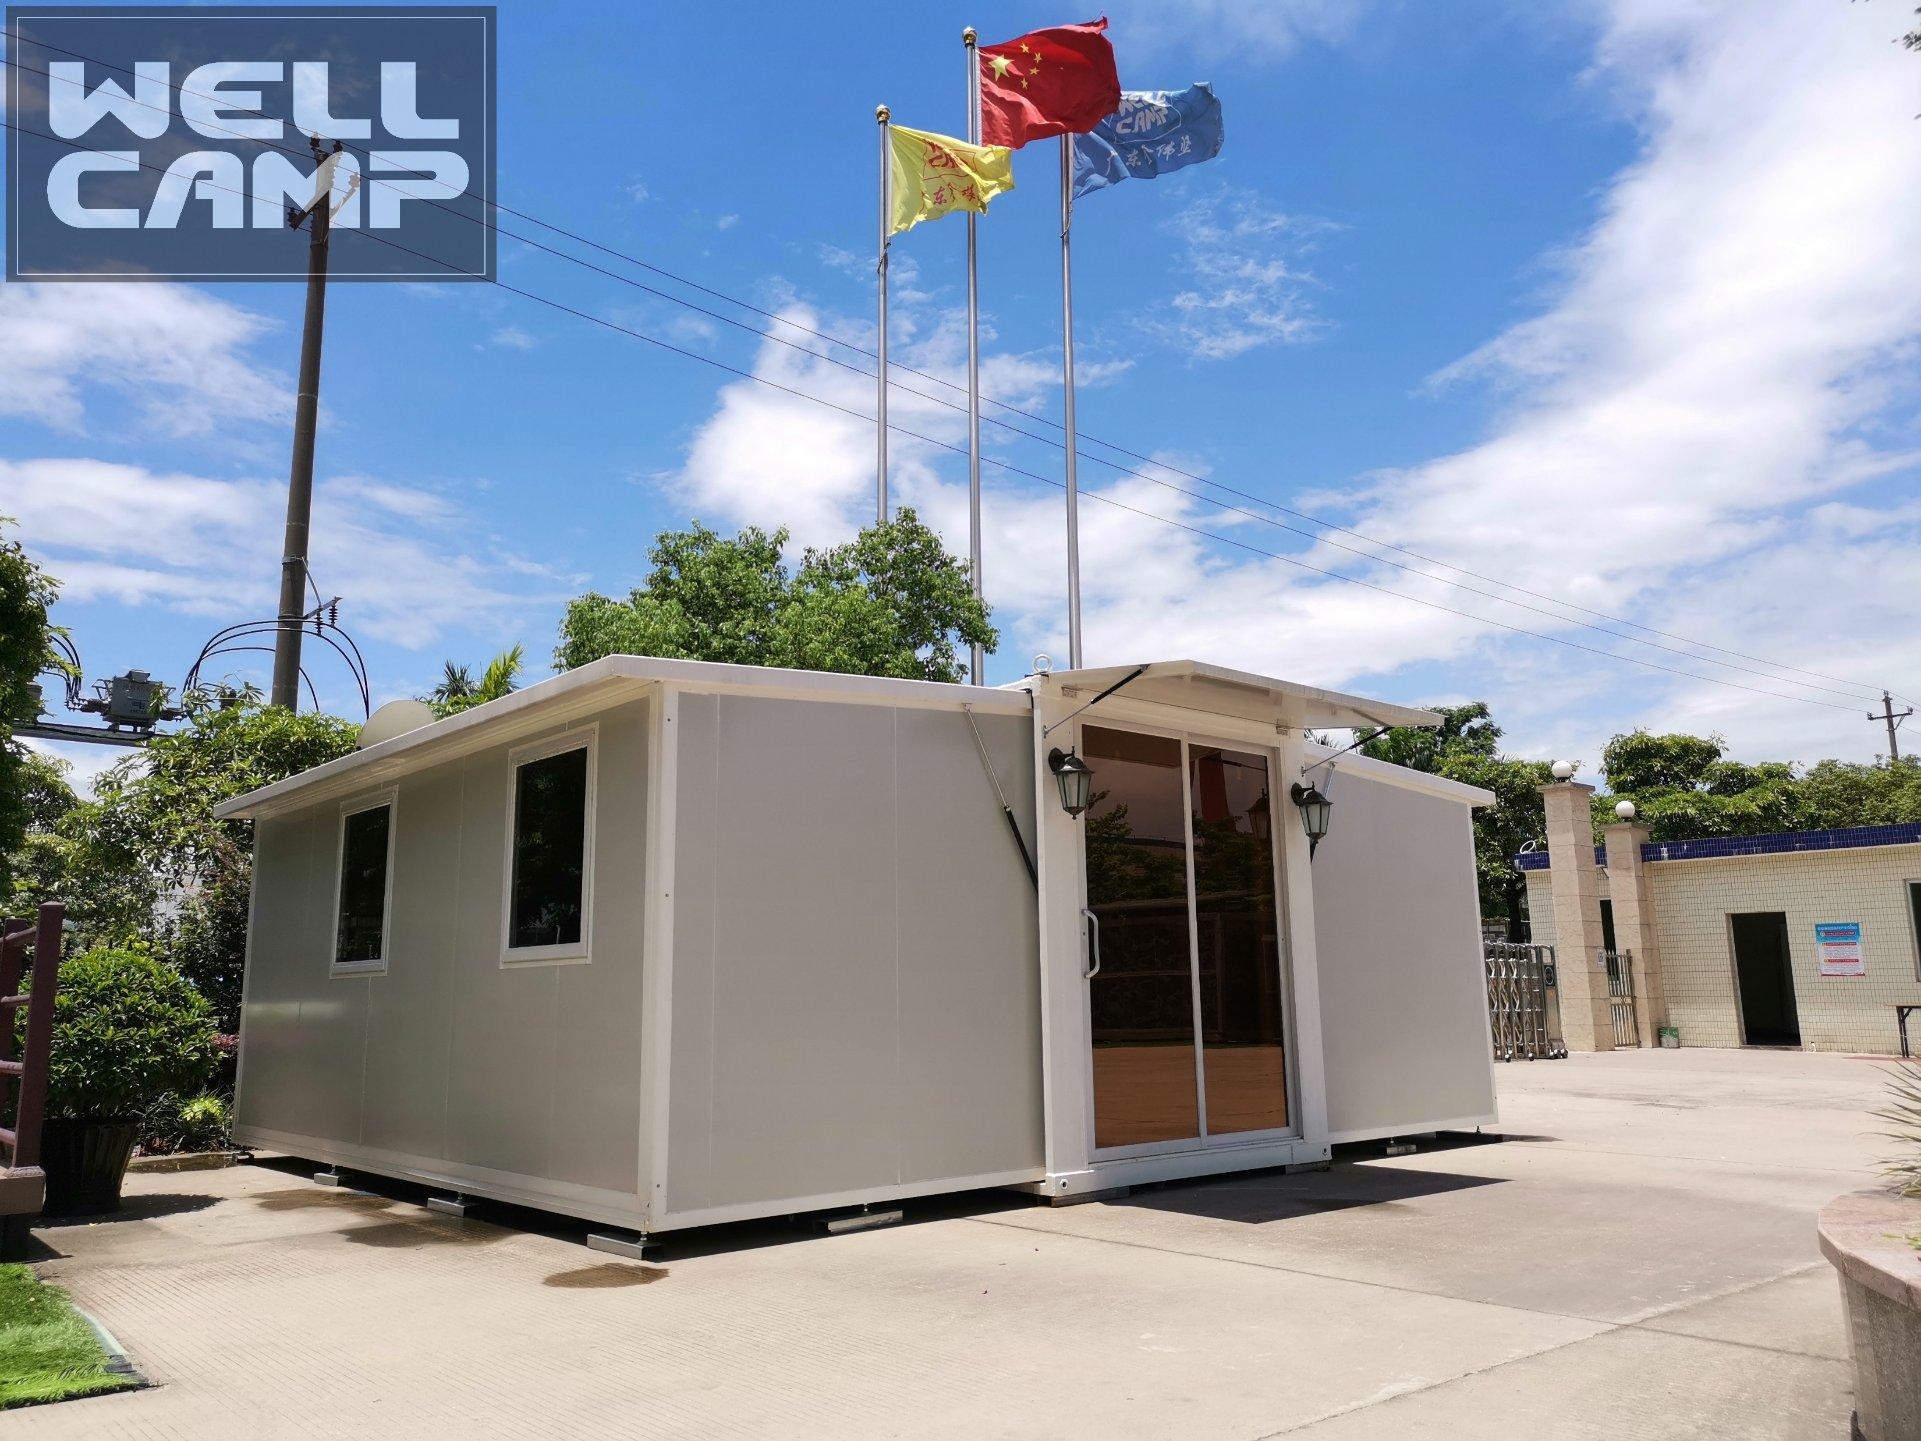 Guangdong Wellcamp Steel Structure&Modular Housing Co., Ltd.